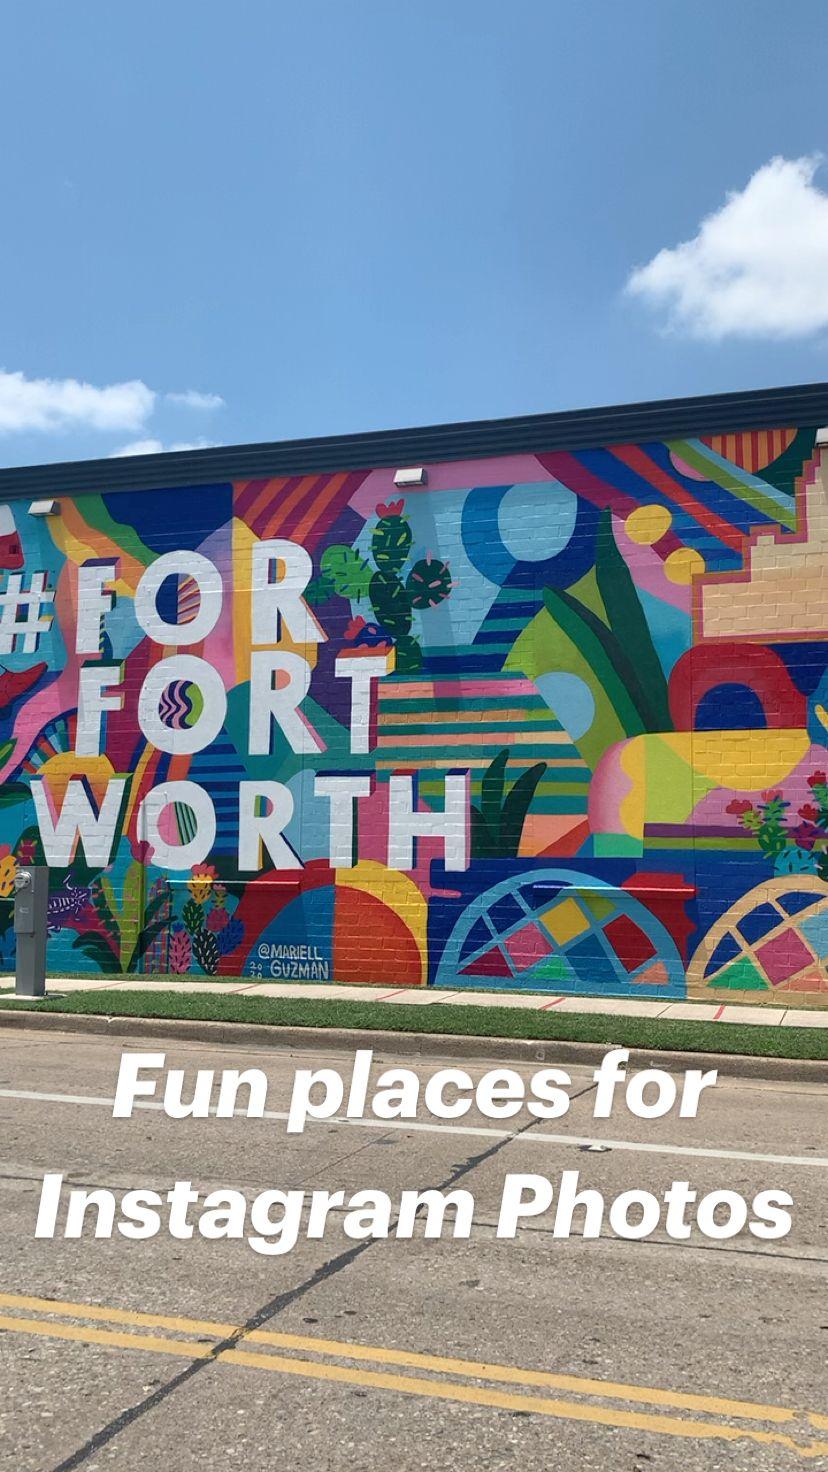 Fun places for Instagram Photos